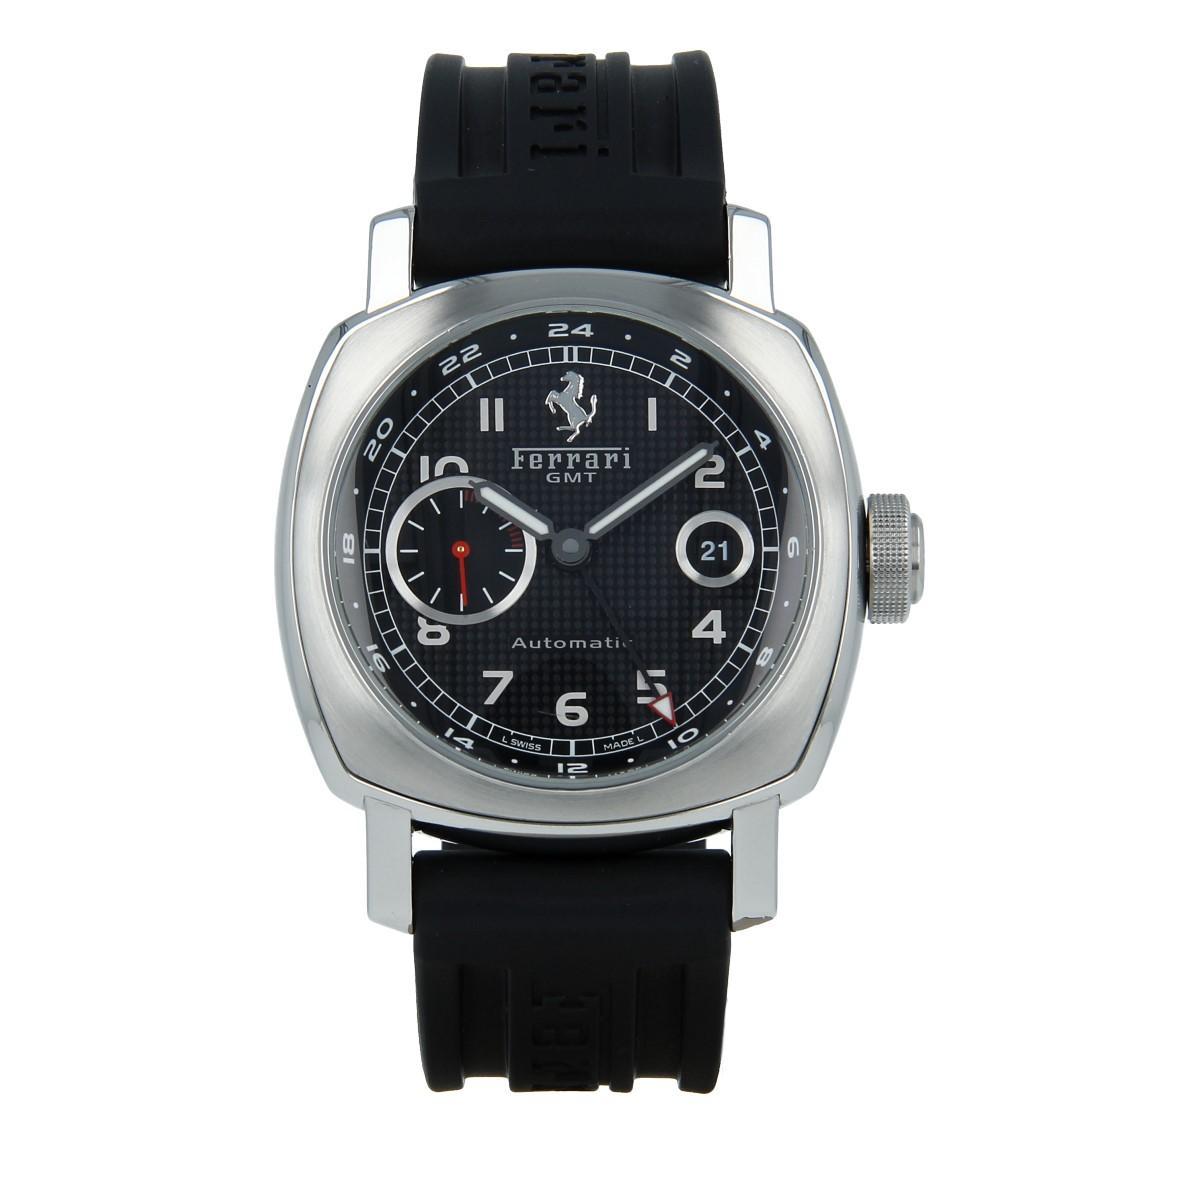 Panerai Ferrari Granturismo Gmt Buy Pre Owned Panerai Watch